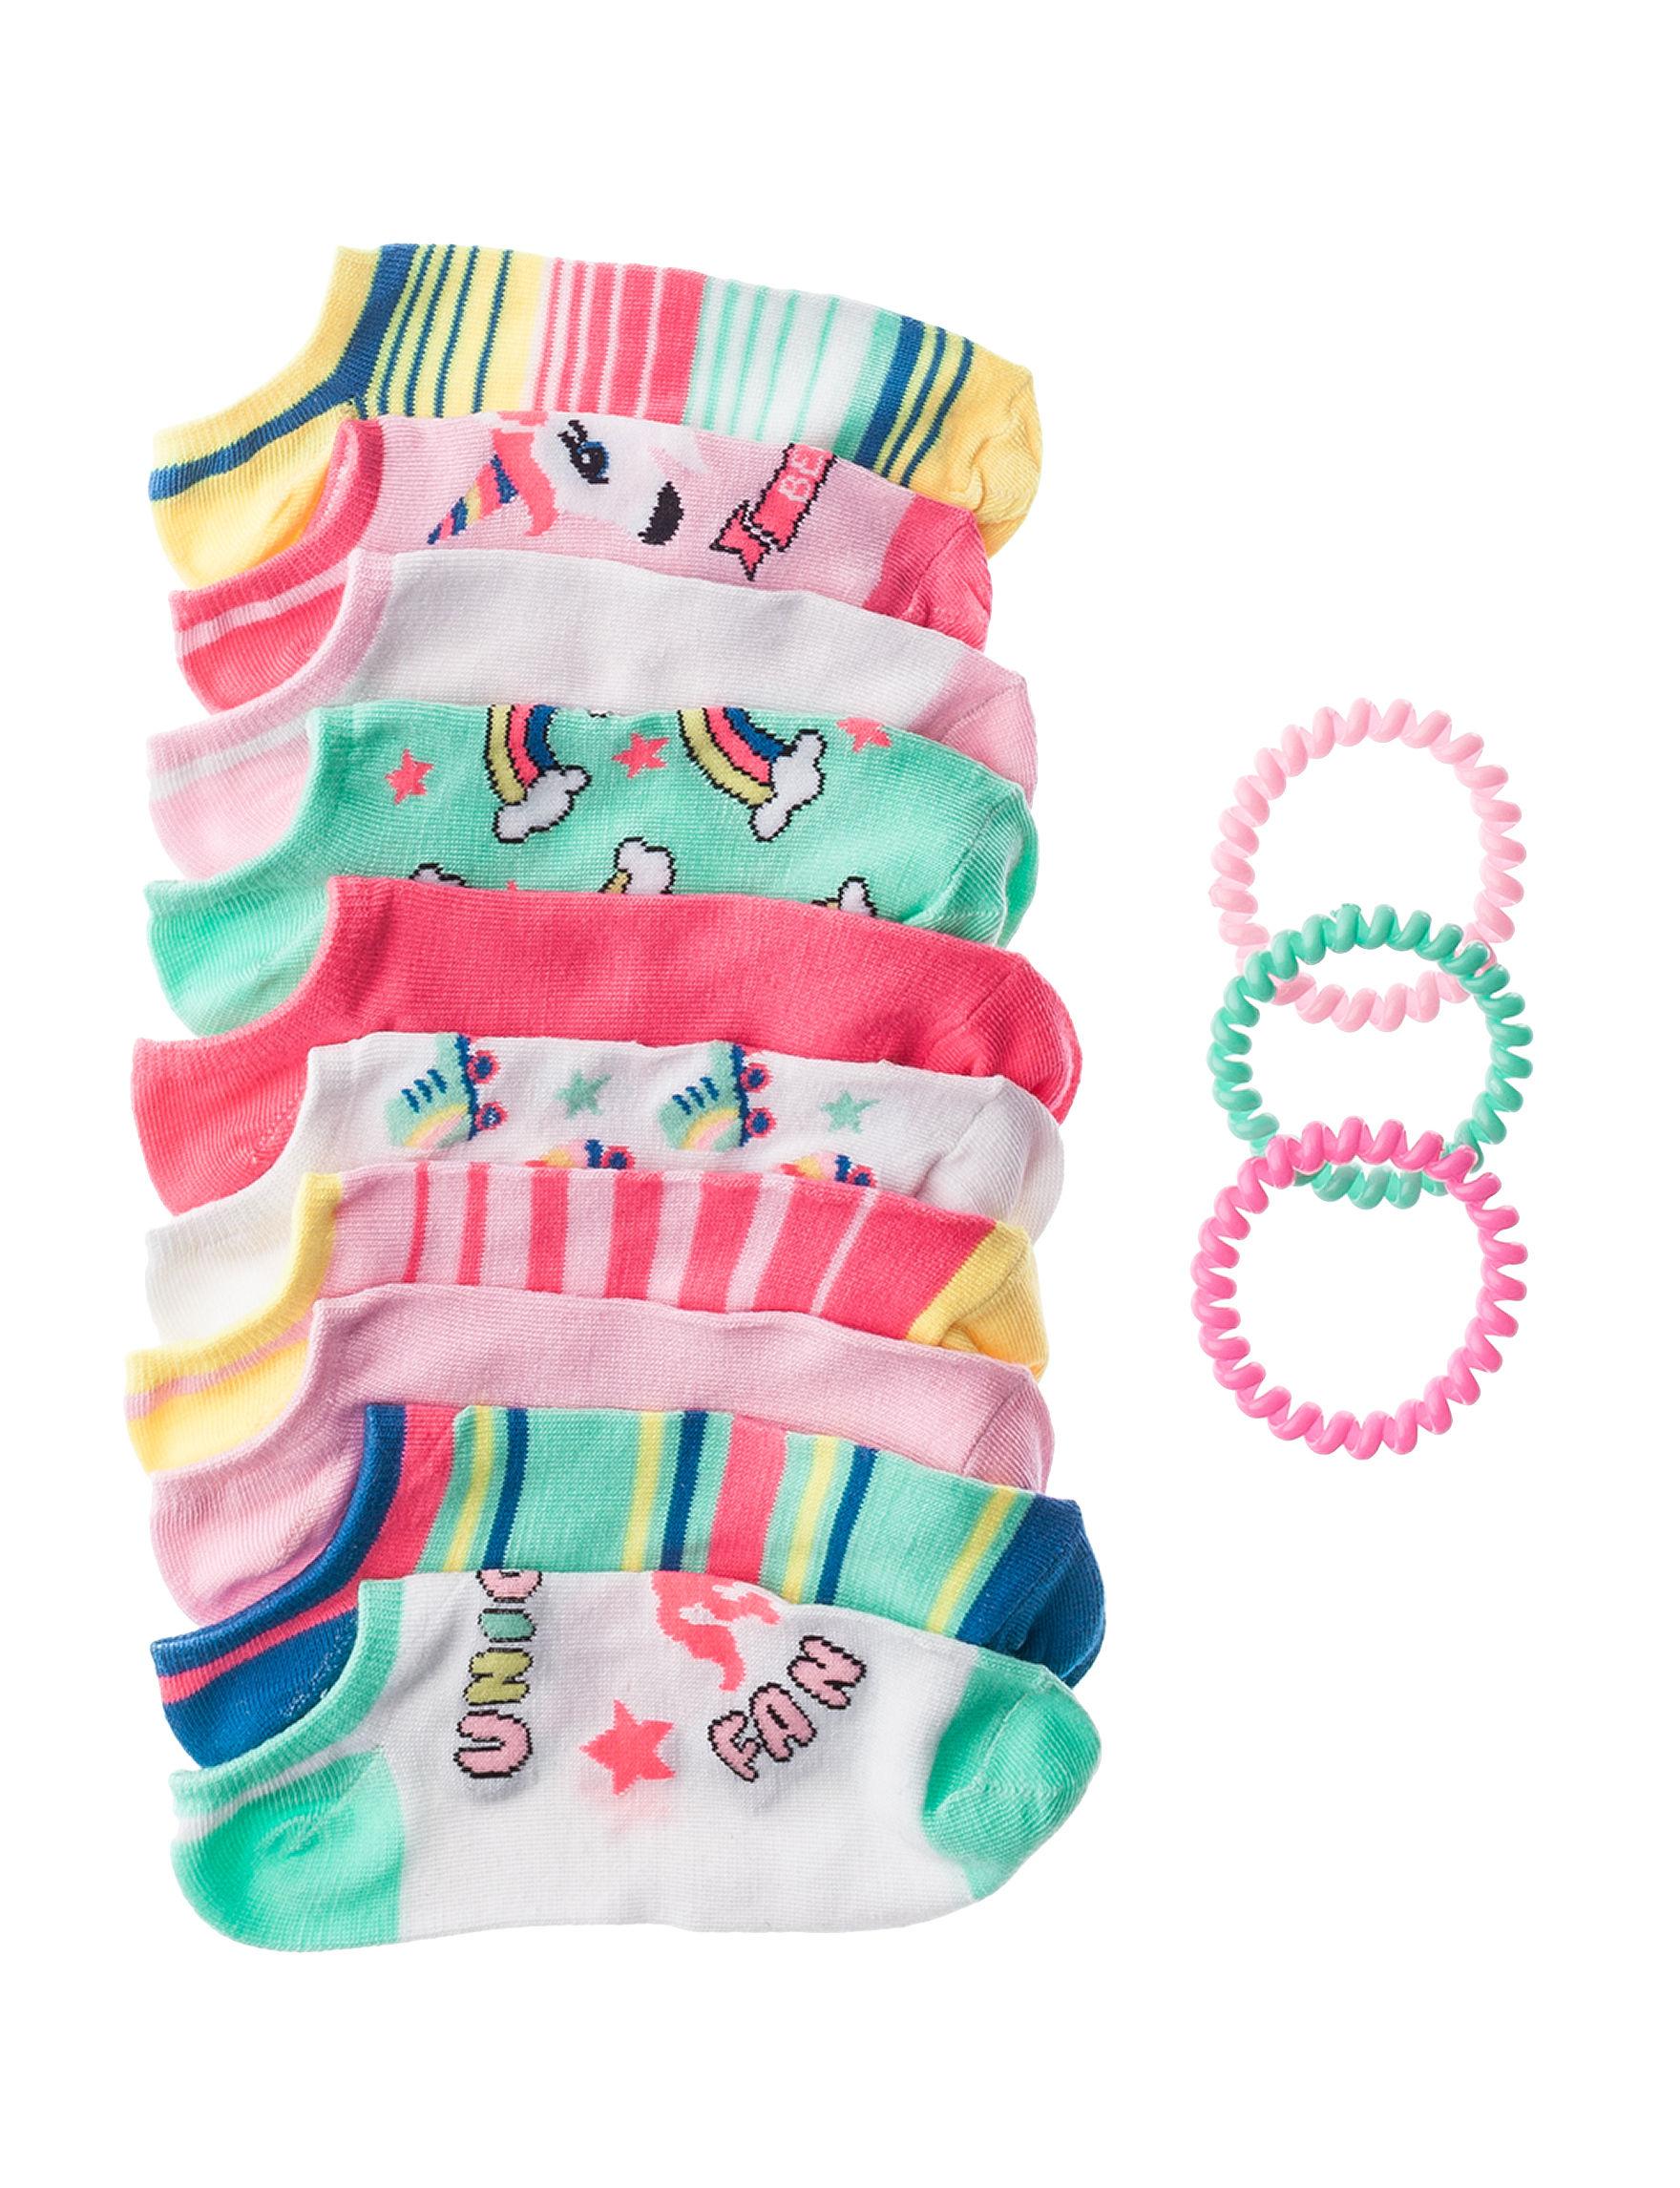 Charlotte & Co. Pink Socks